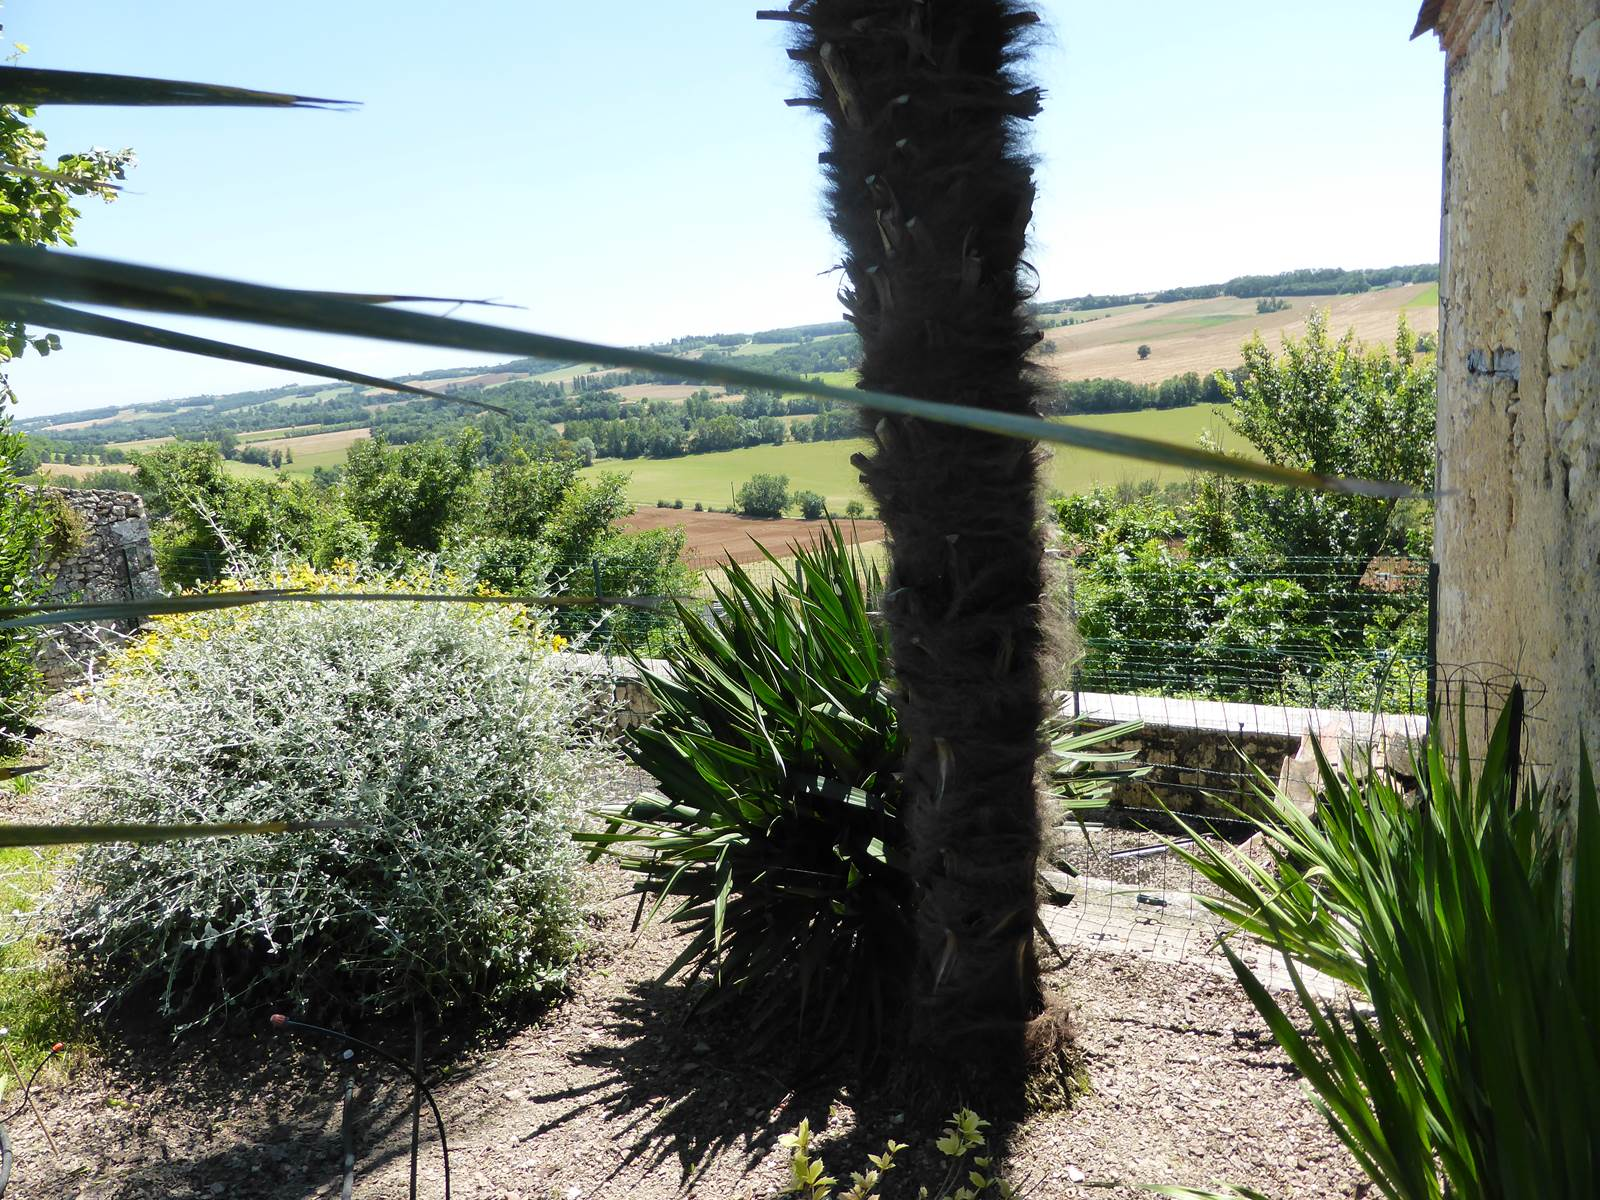 Saint Roch chambres d'hôtes fond du jardin vers vallée.jpg